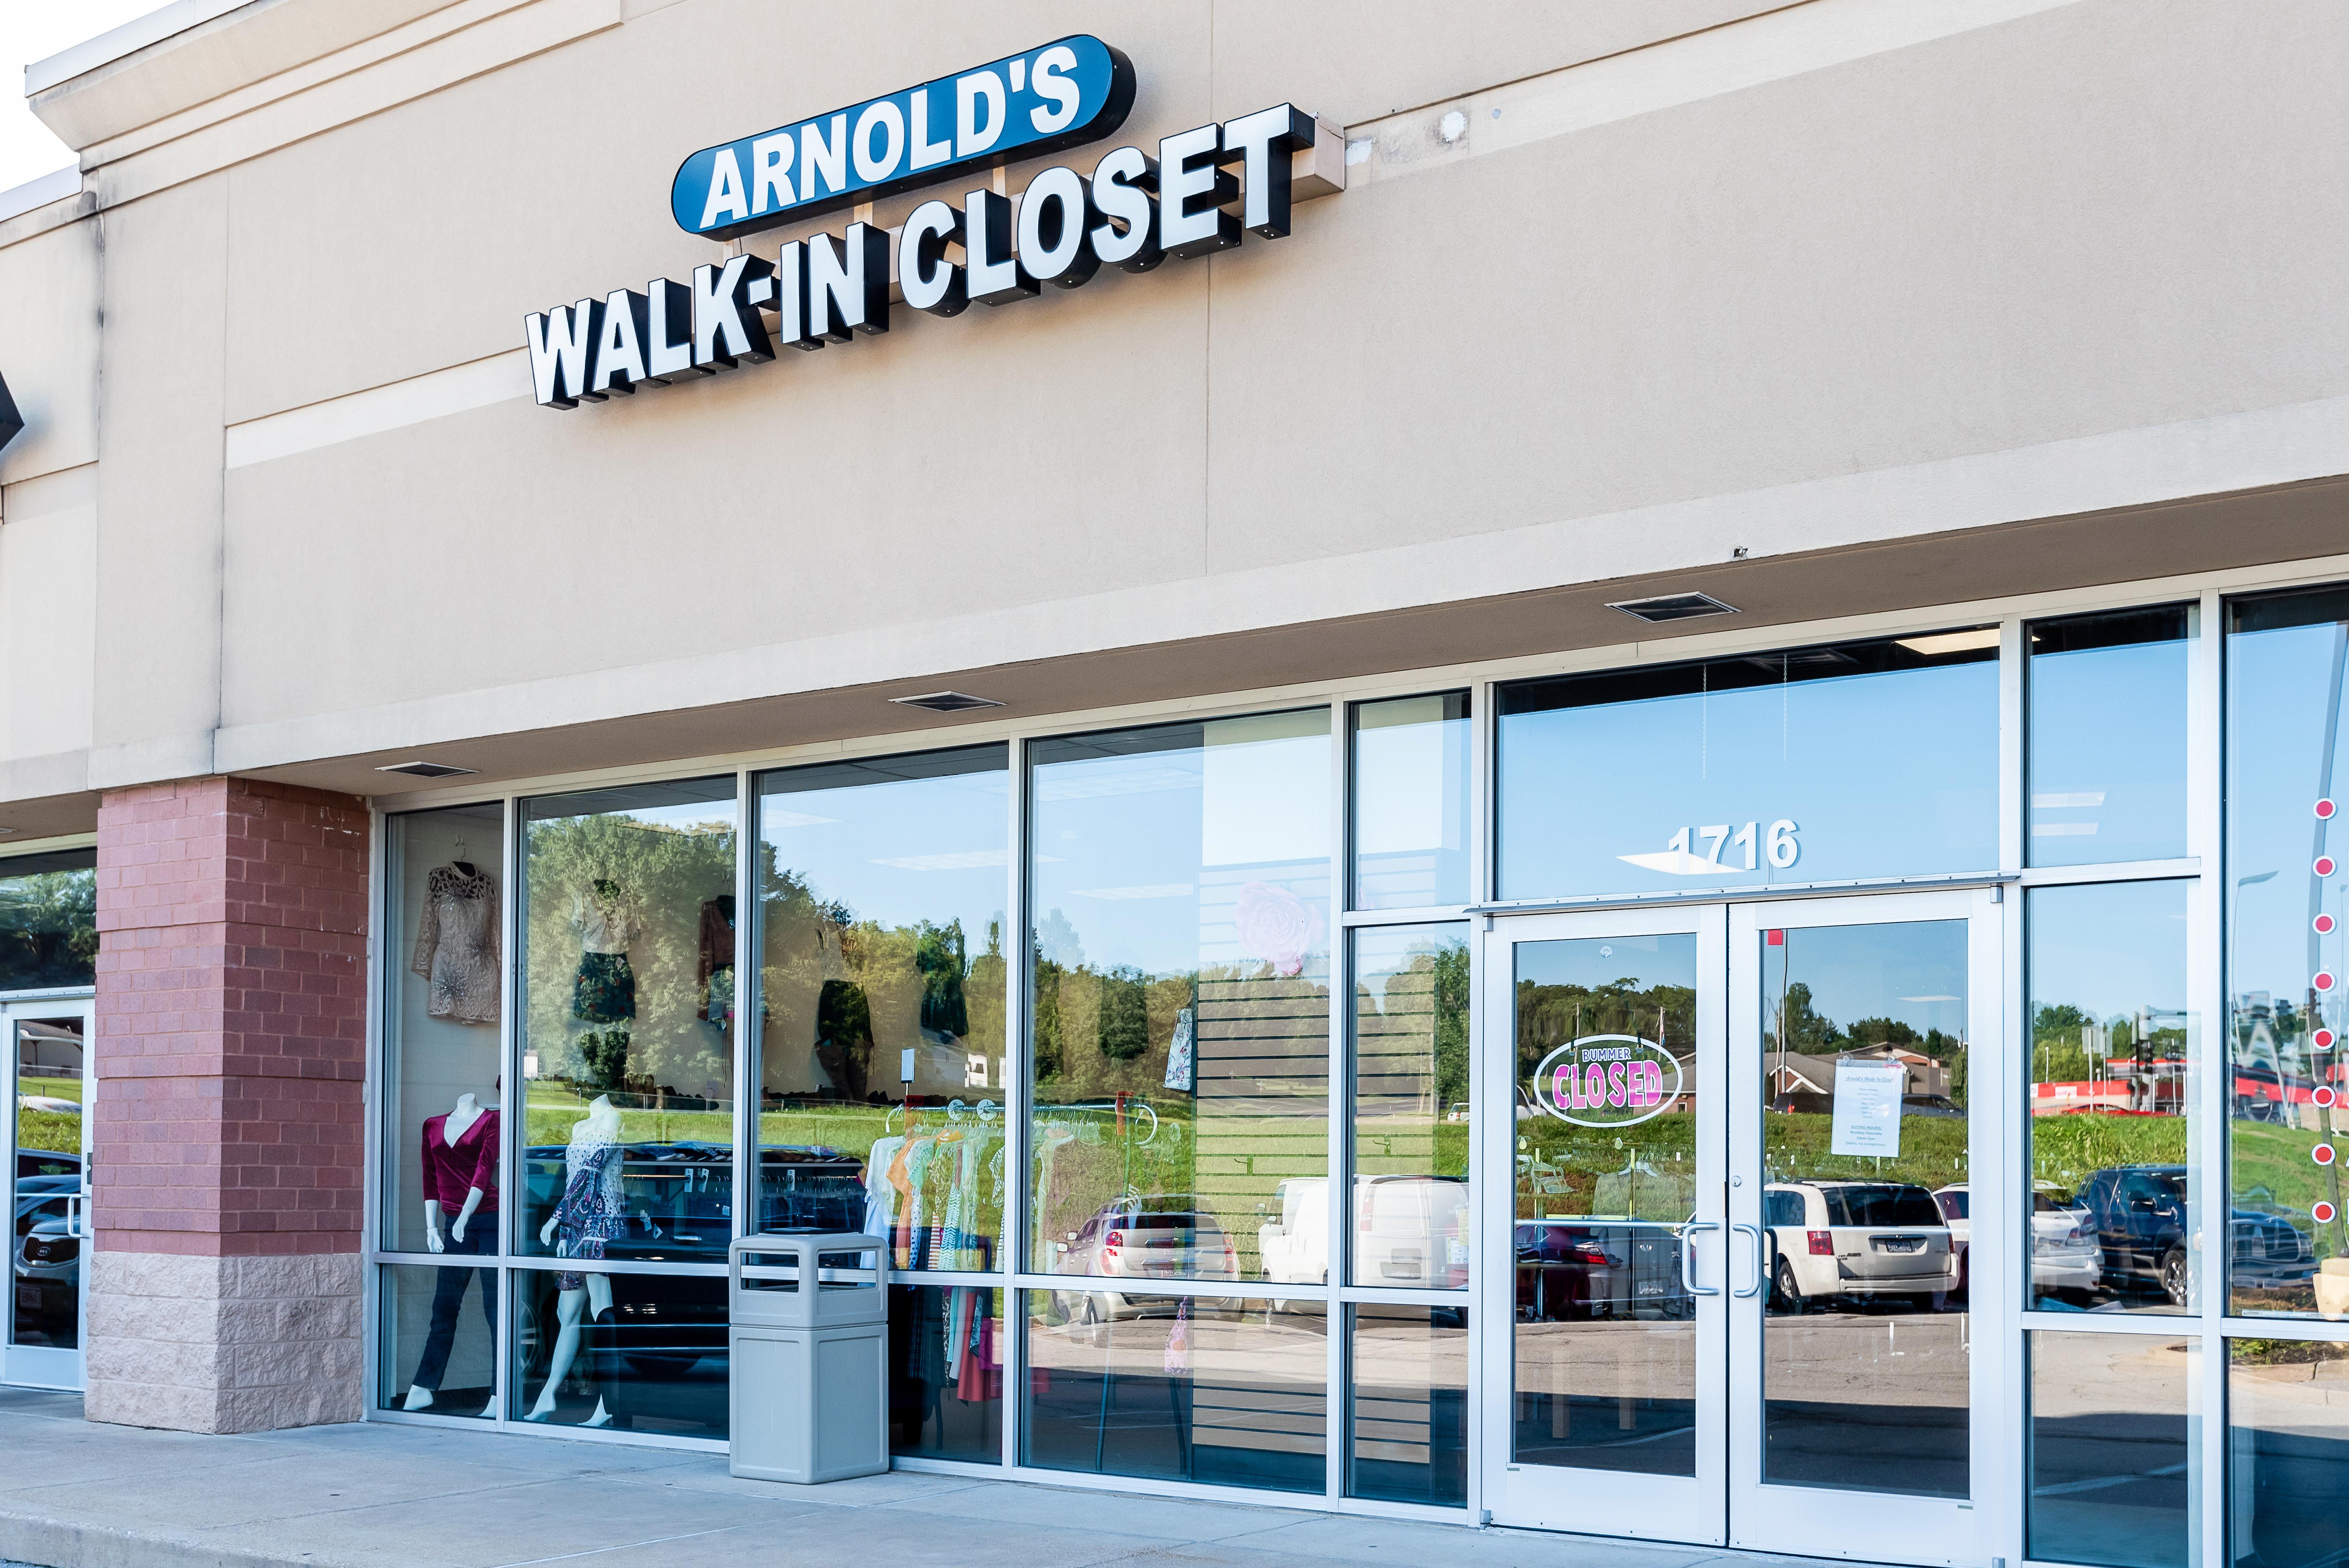 Arnold'sWalkInCloset-21